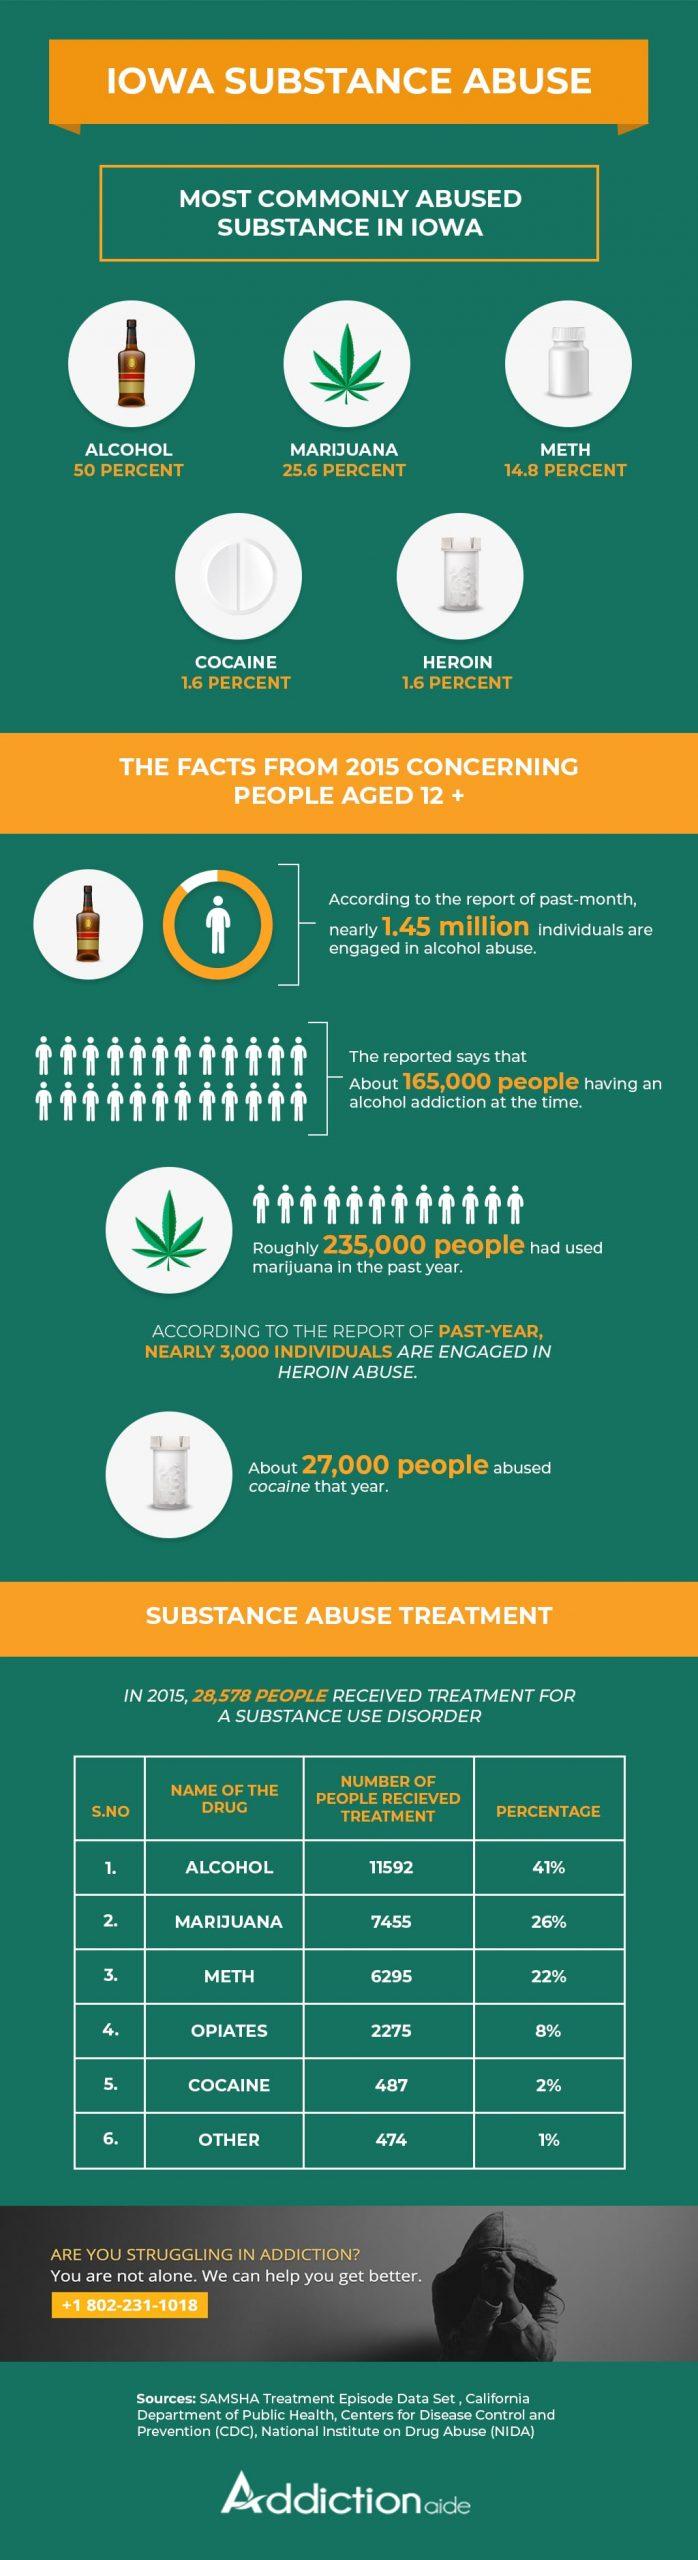 Iowa substance abuse